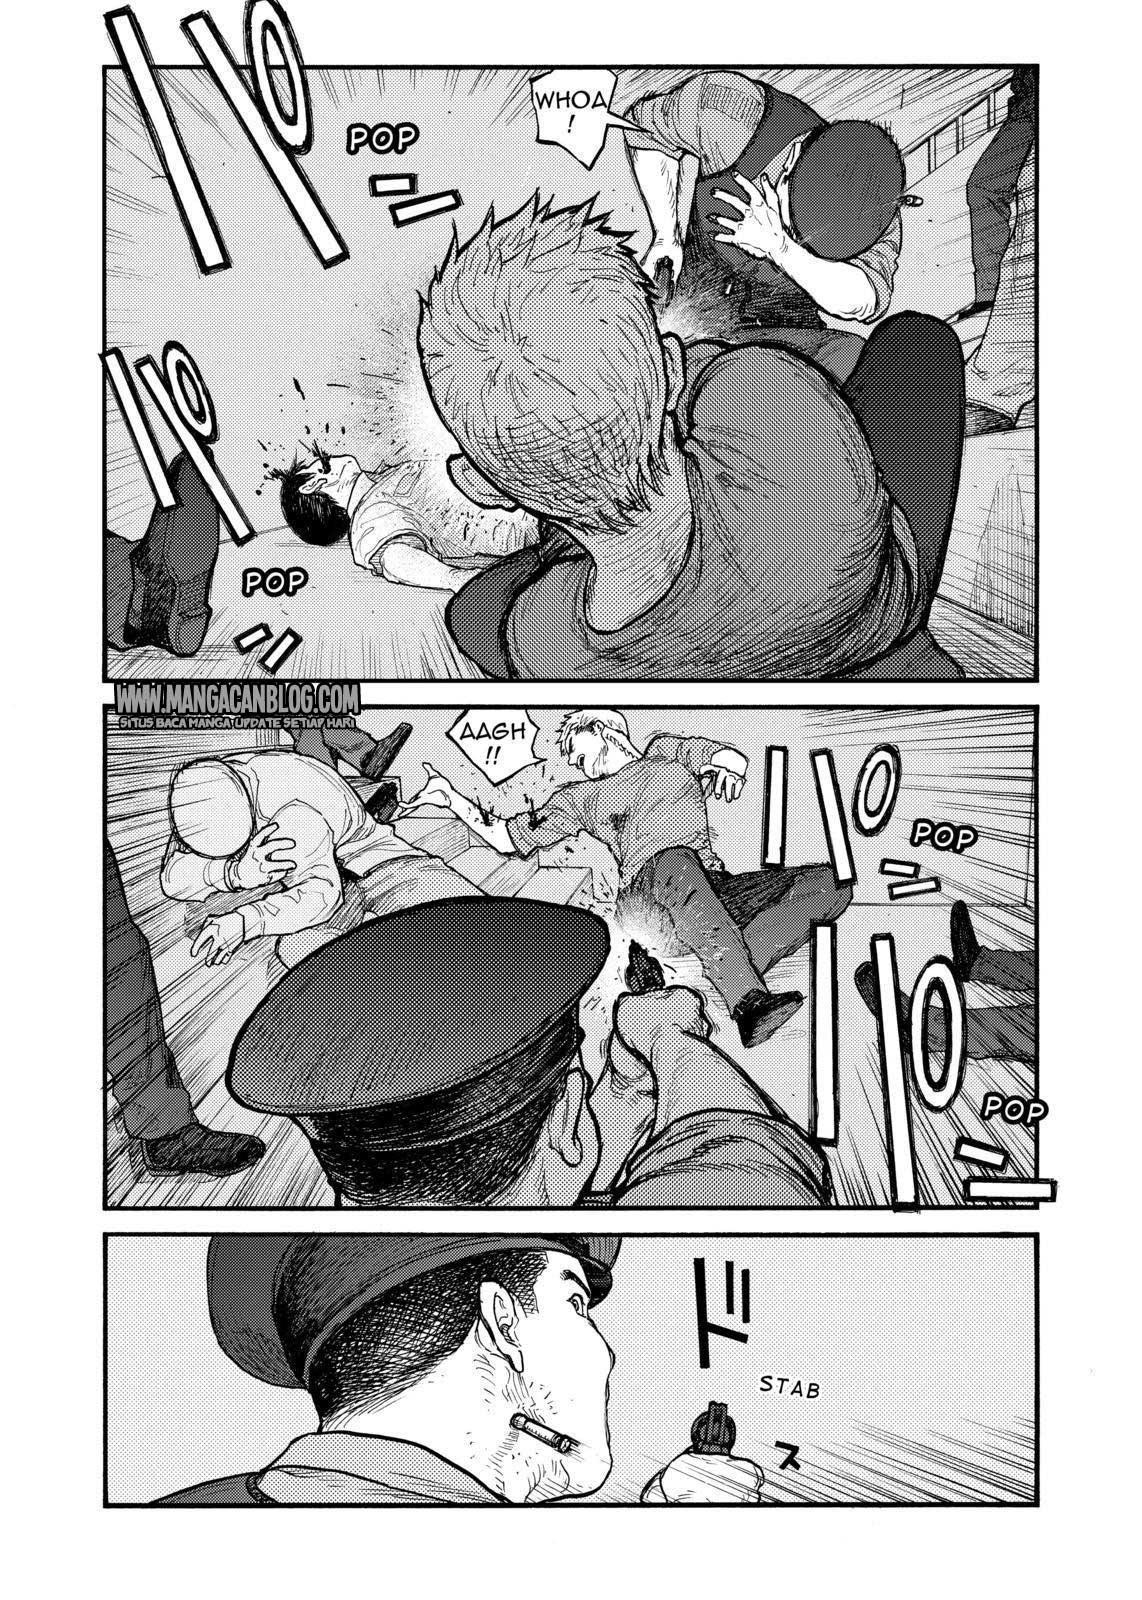 Dilarang COPAS - situs resmi www.mangacanblog.com - Komik ajin 039 - garis keras medan pertempuran 2 40 Indonesia ajin 039 - garis keras medan pertempuran 2 Terbaru 24|Baca Manga Komik Indonesia|Mangacan